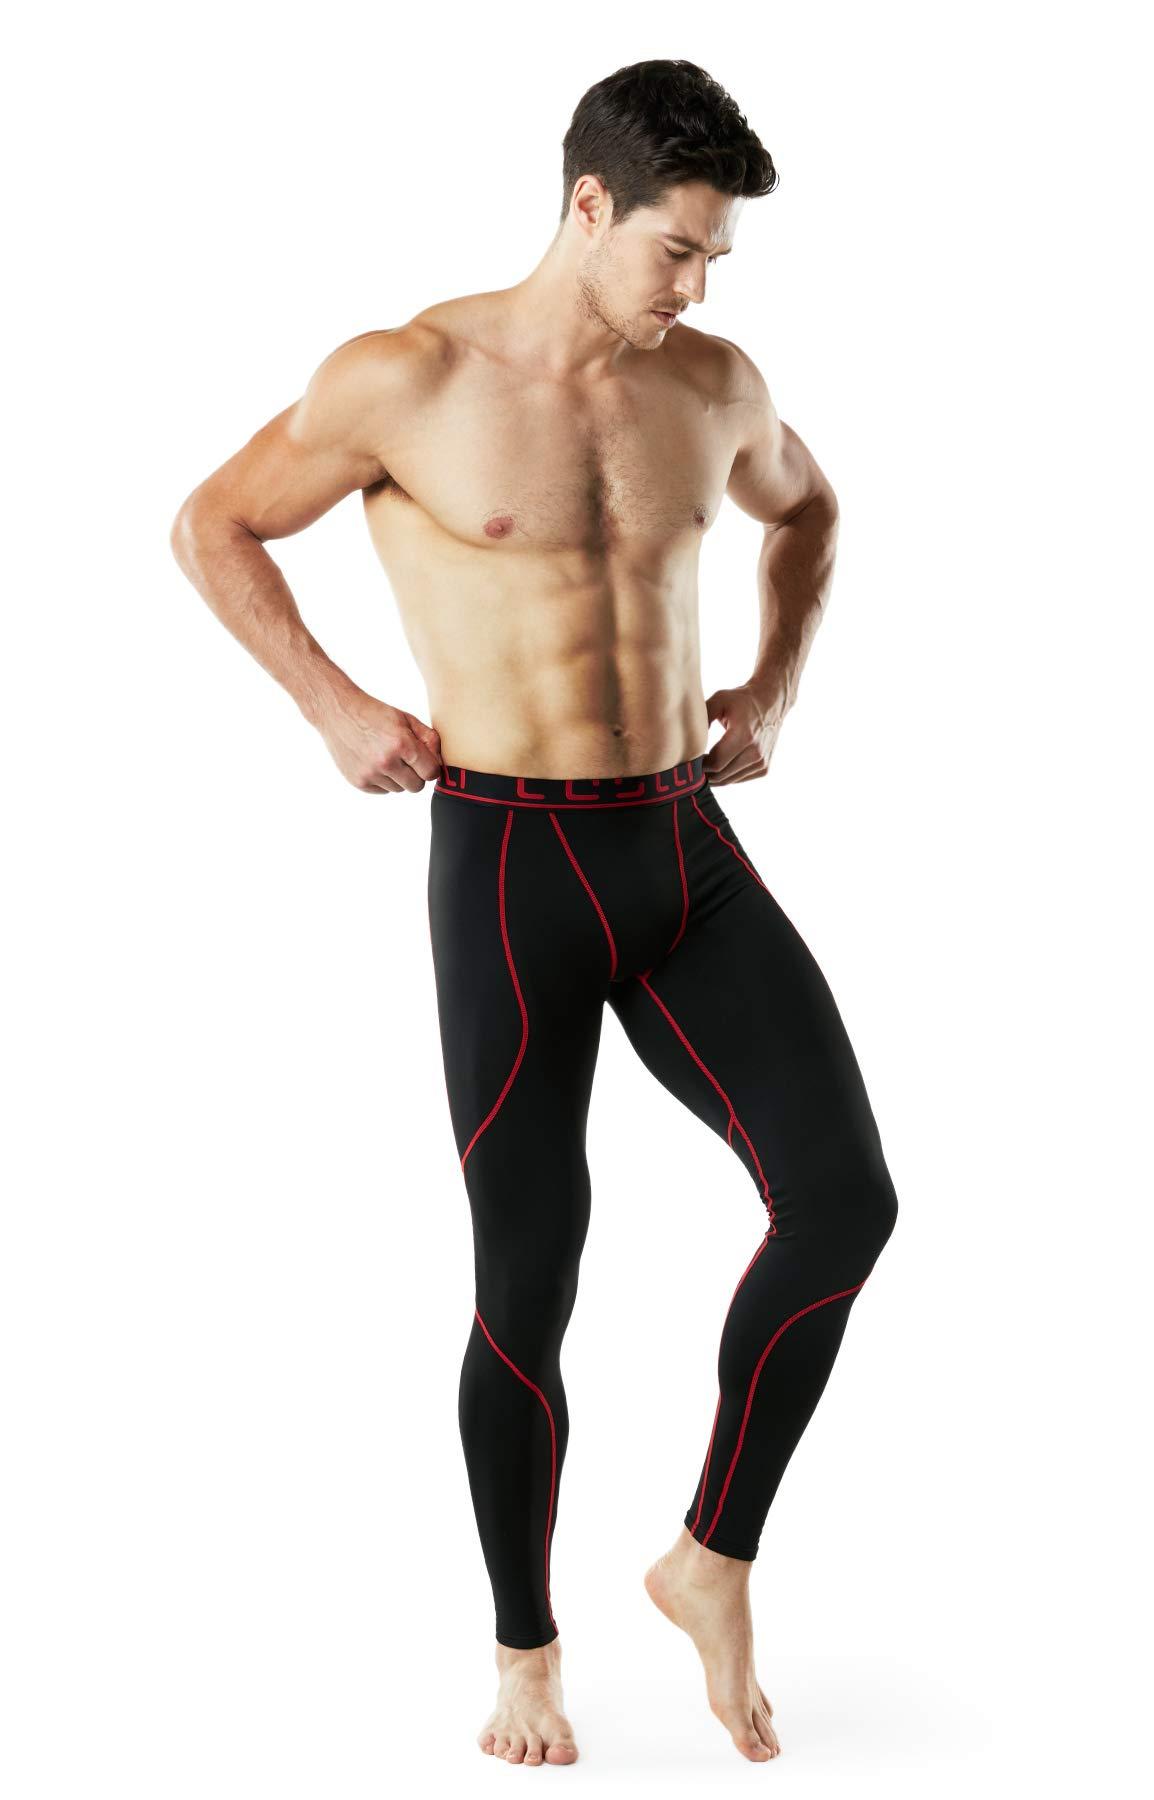 TSLA TM-YUP43-KKR_3X-Large Men's Emboss Pants Thermal Wintergear Compression Baselayer Sports Leggings YUP43 by TSLA (Image #7)